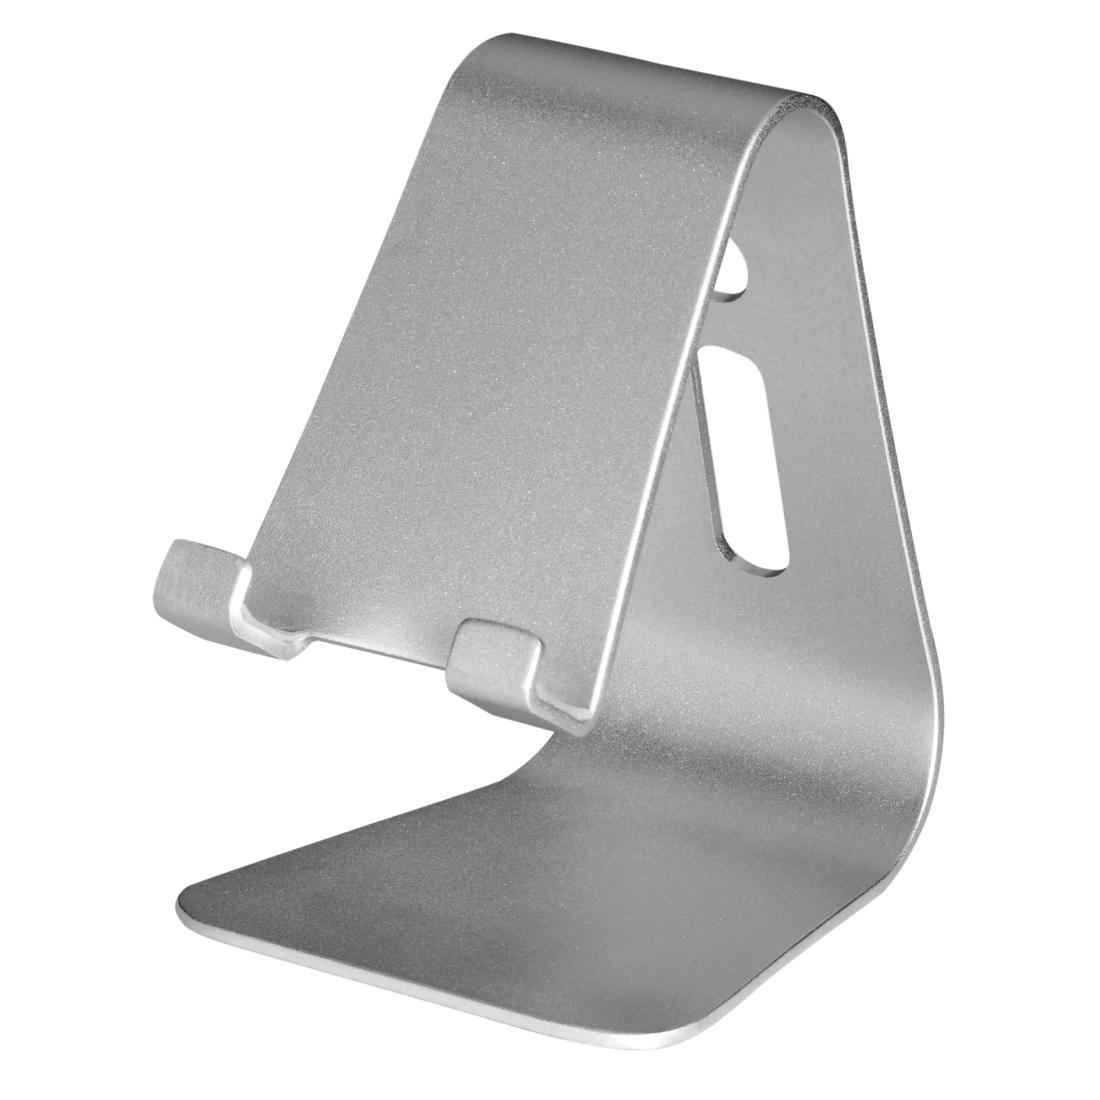 00016399 hama smartphone halter stand hama de. Black Bedroom Furniture Sets. Home Design Ideas